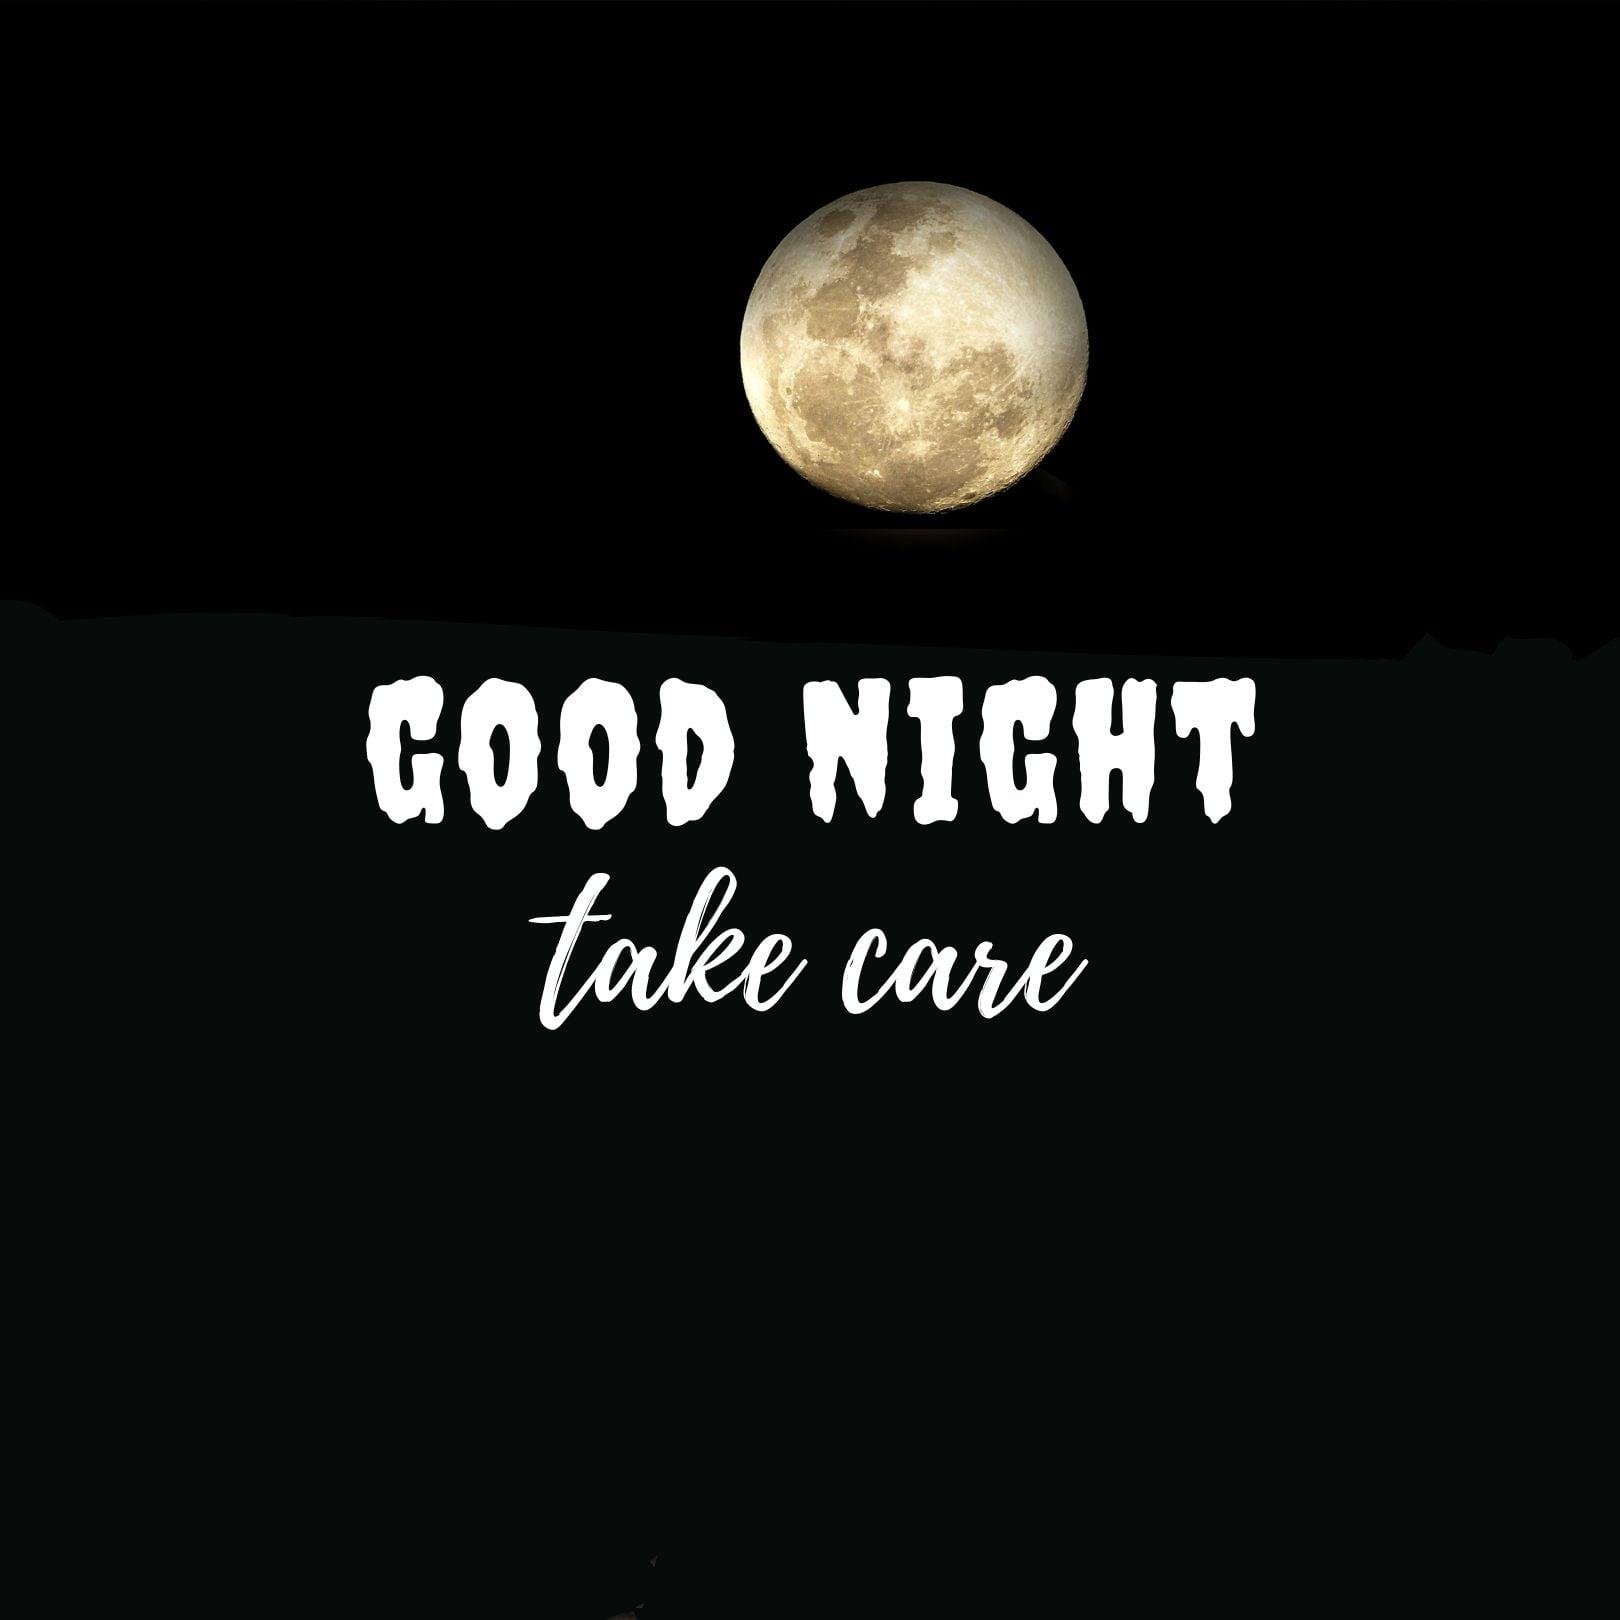 Good Night take care pic hd full HD free download.